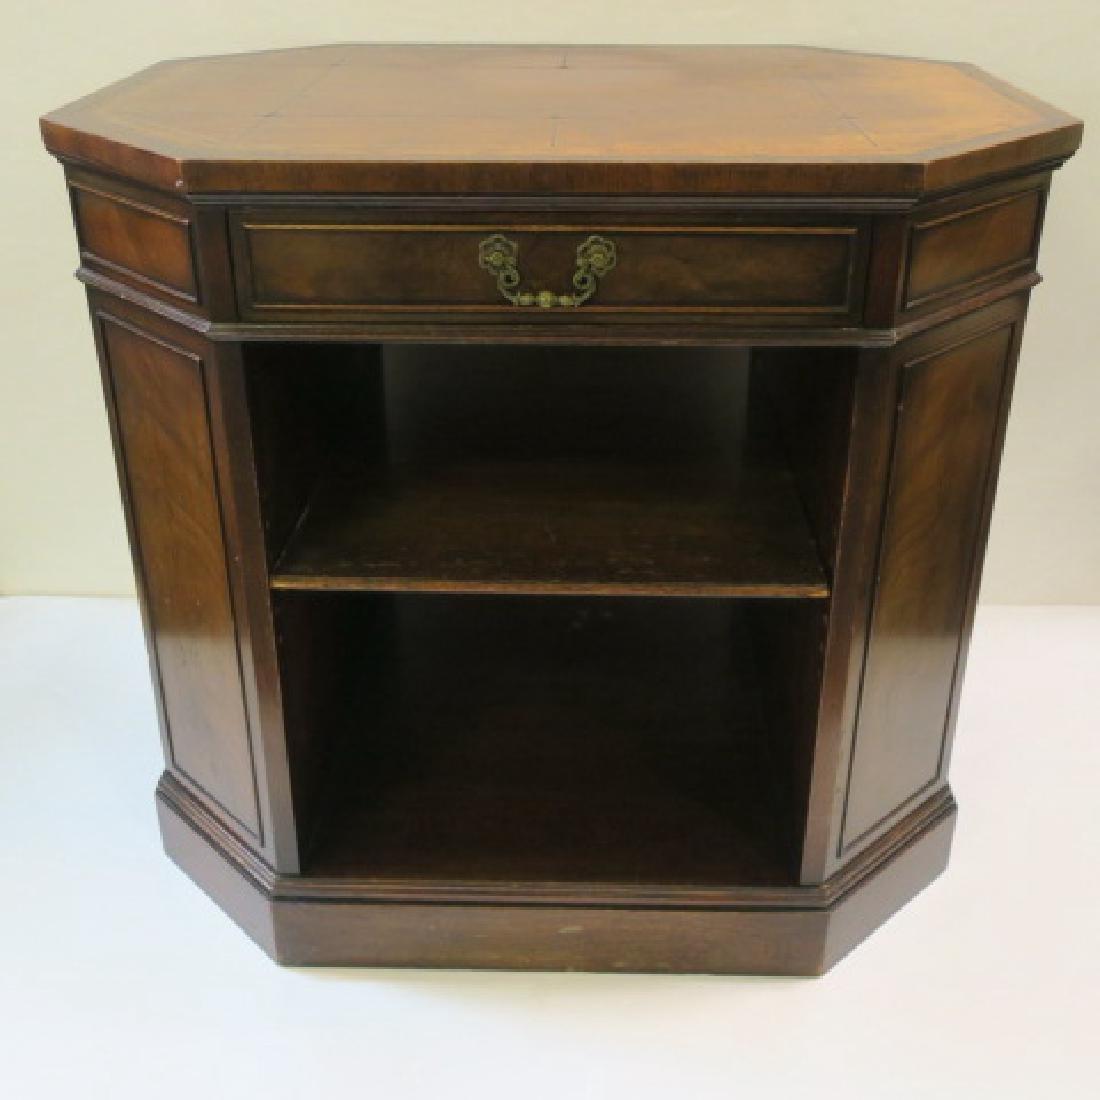 Leather top Book Shelf Octagonal Center Desk: